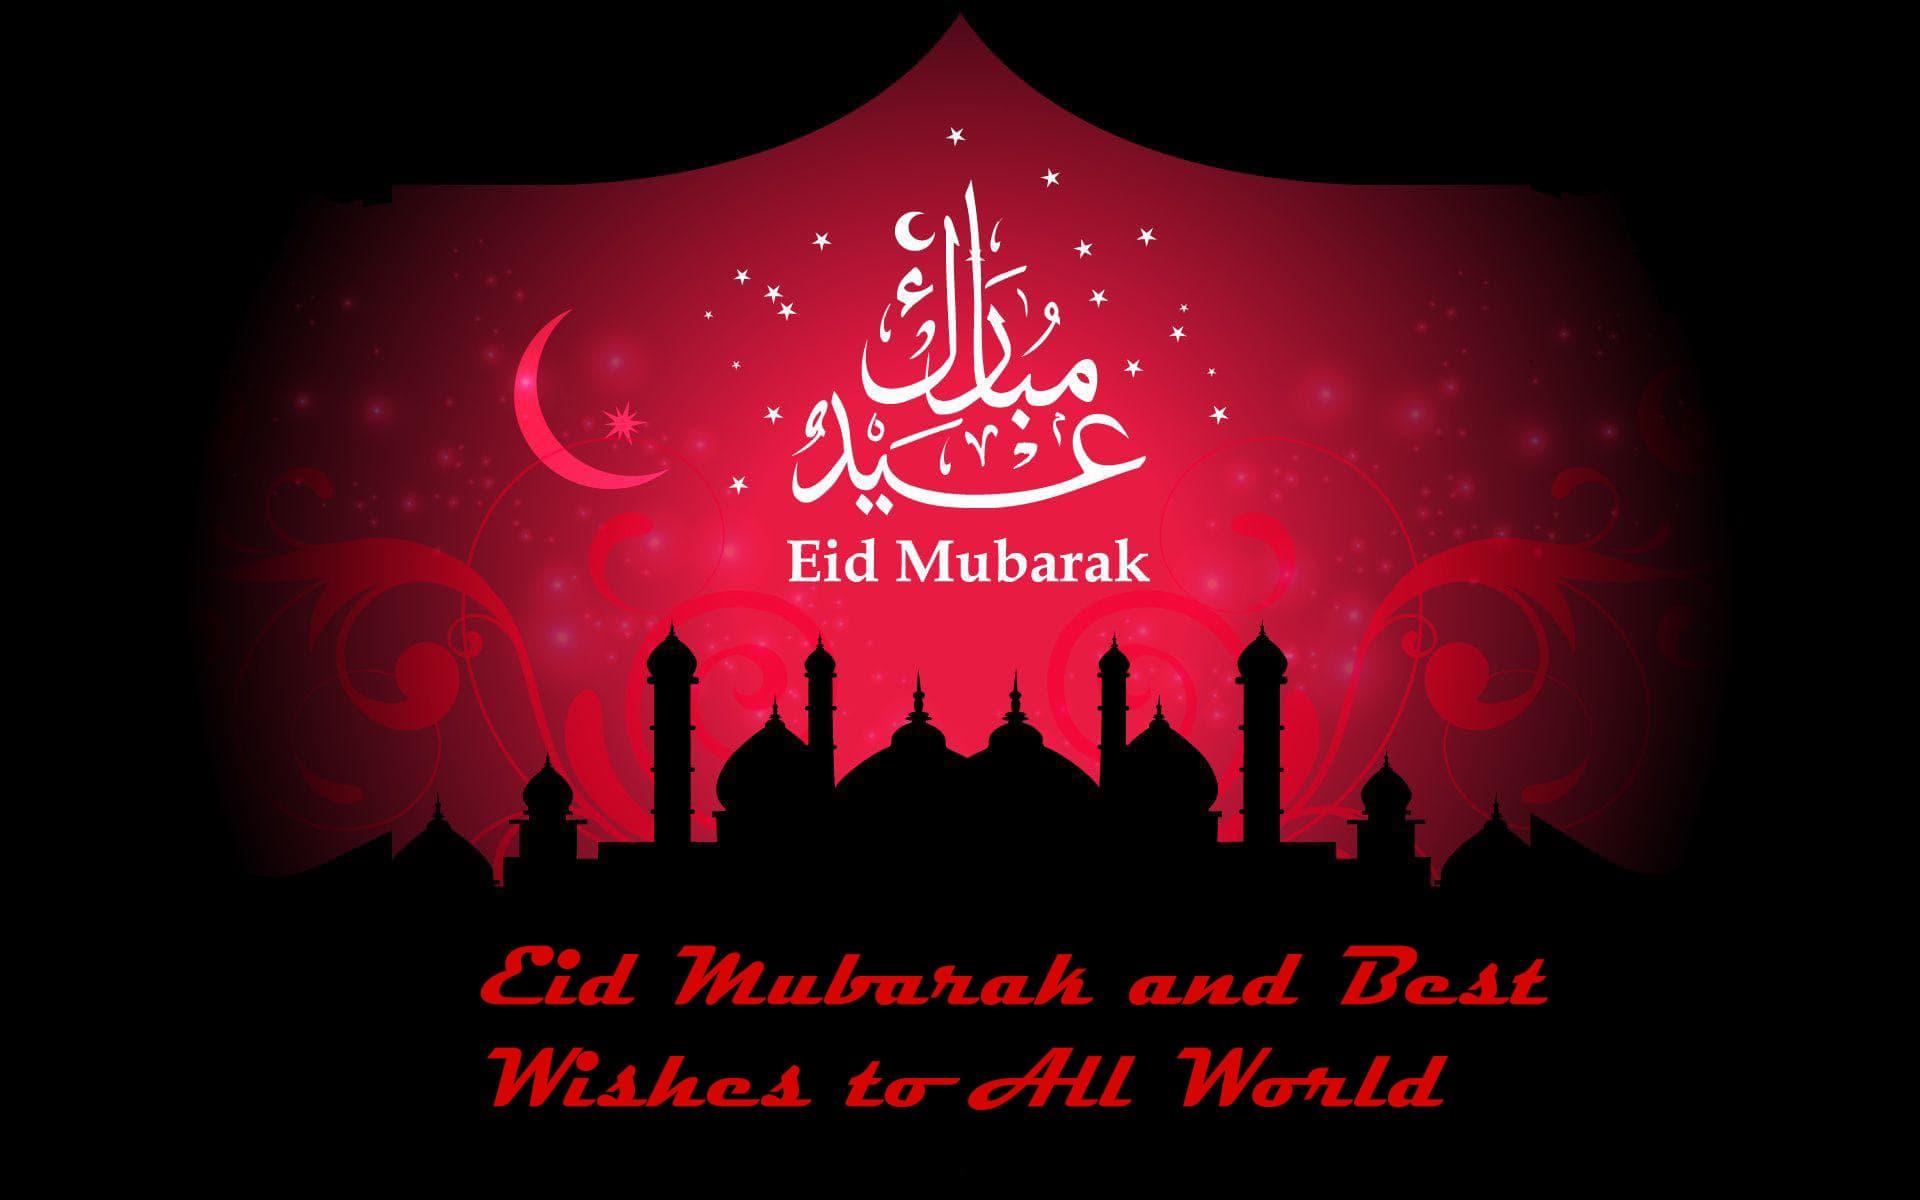 Best Eid Mubarak Wallpaper Eid Mubarak 2020 4k 1920x1200 Download Hd Wallpaper Wallpapertip